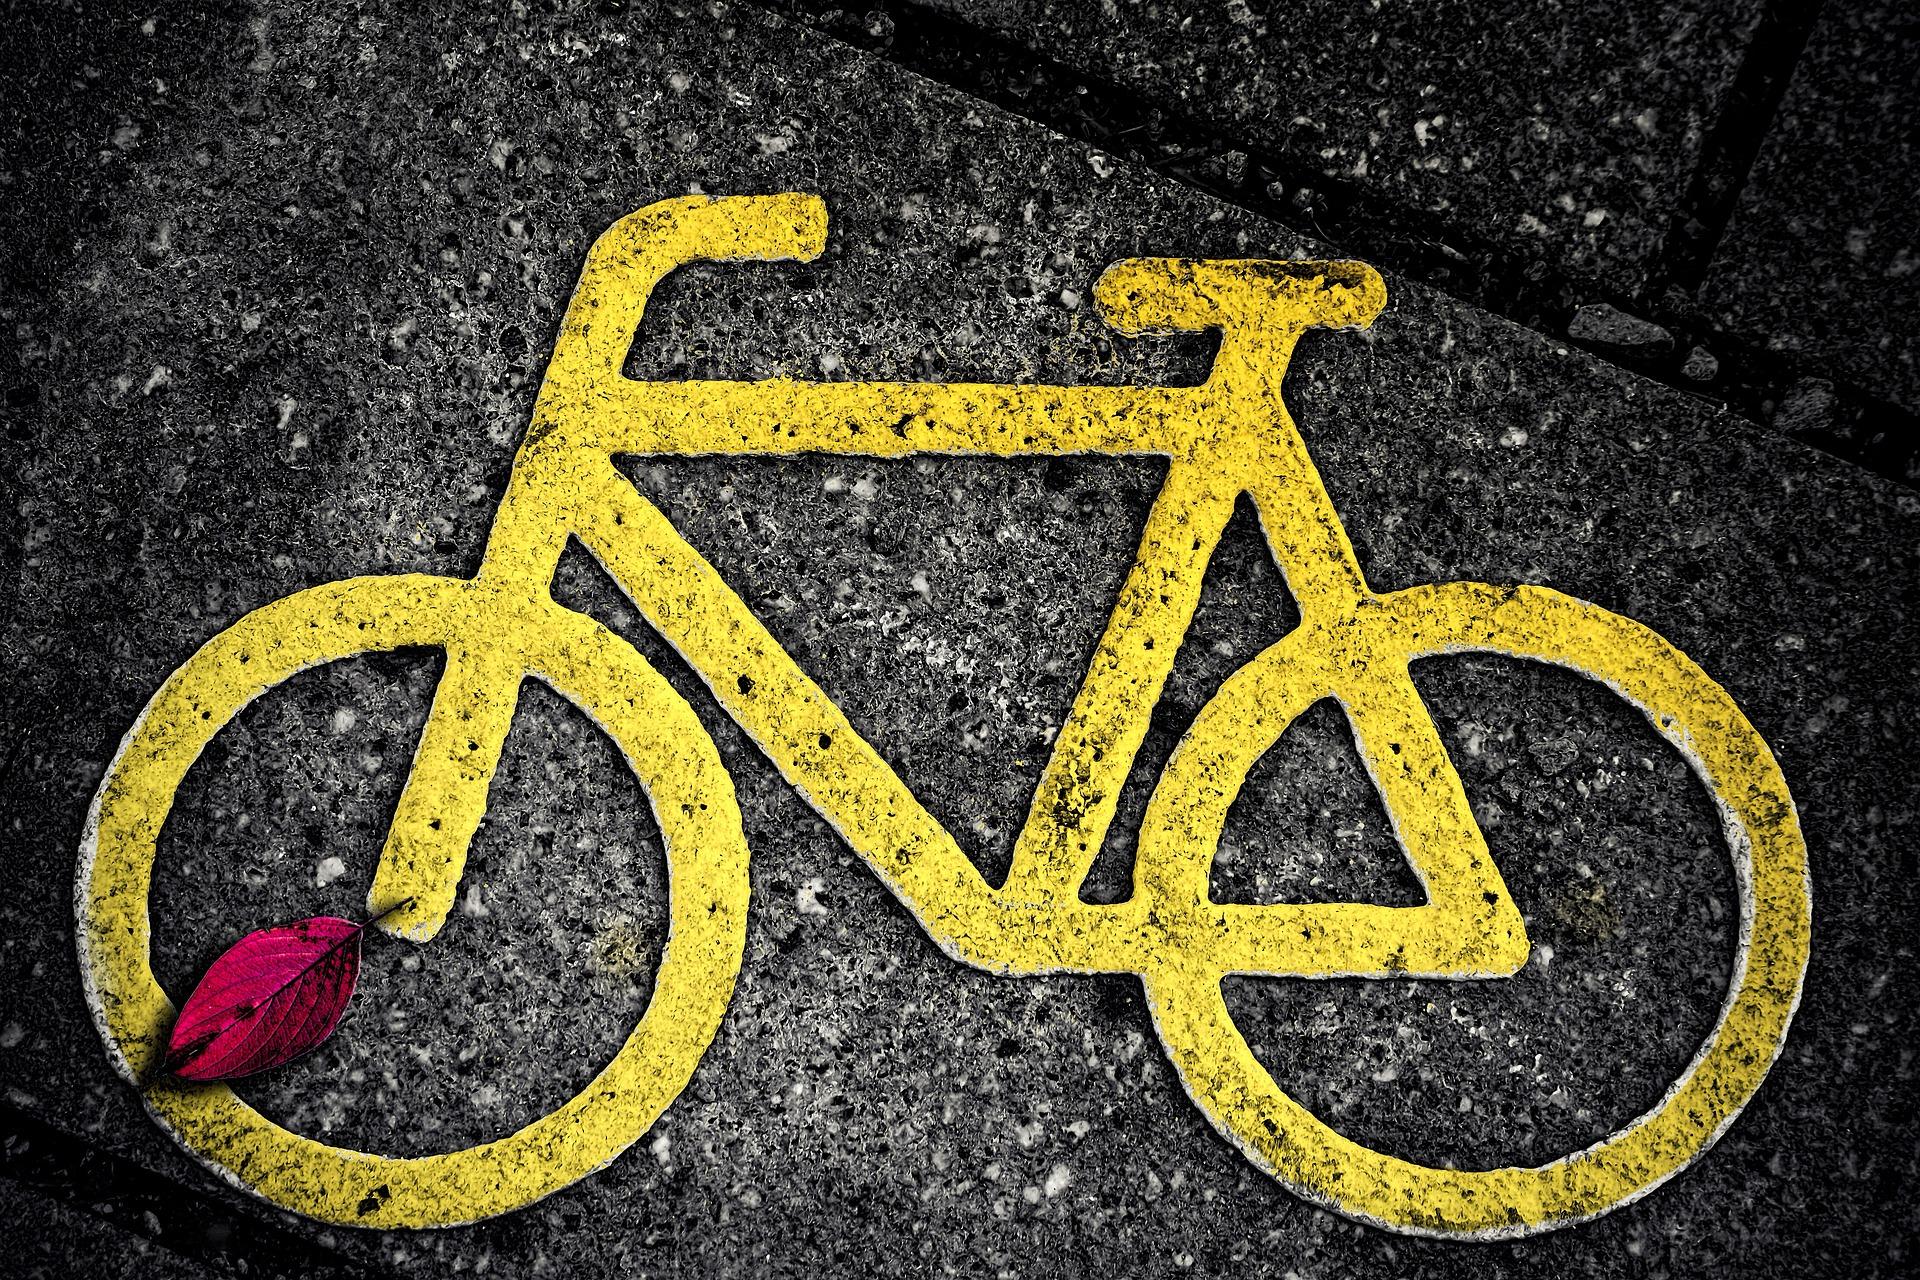 Radverkehr auf die Überholspur bekommen